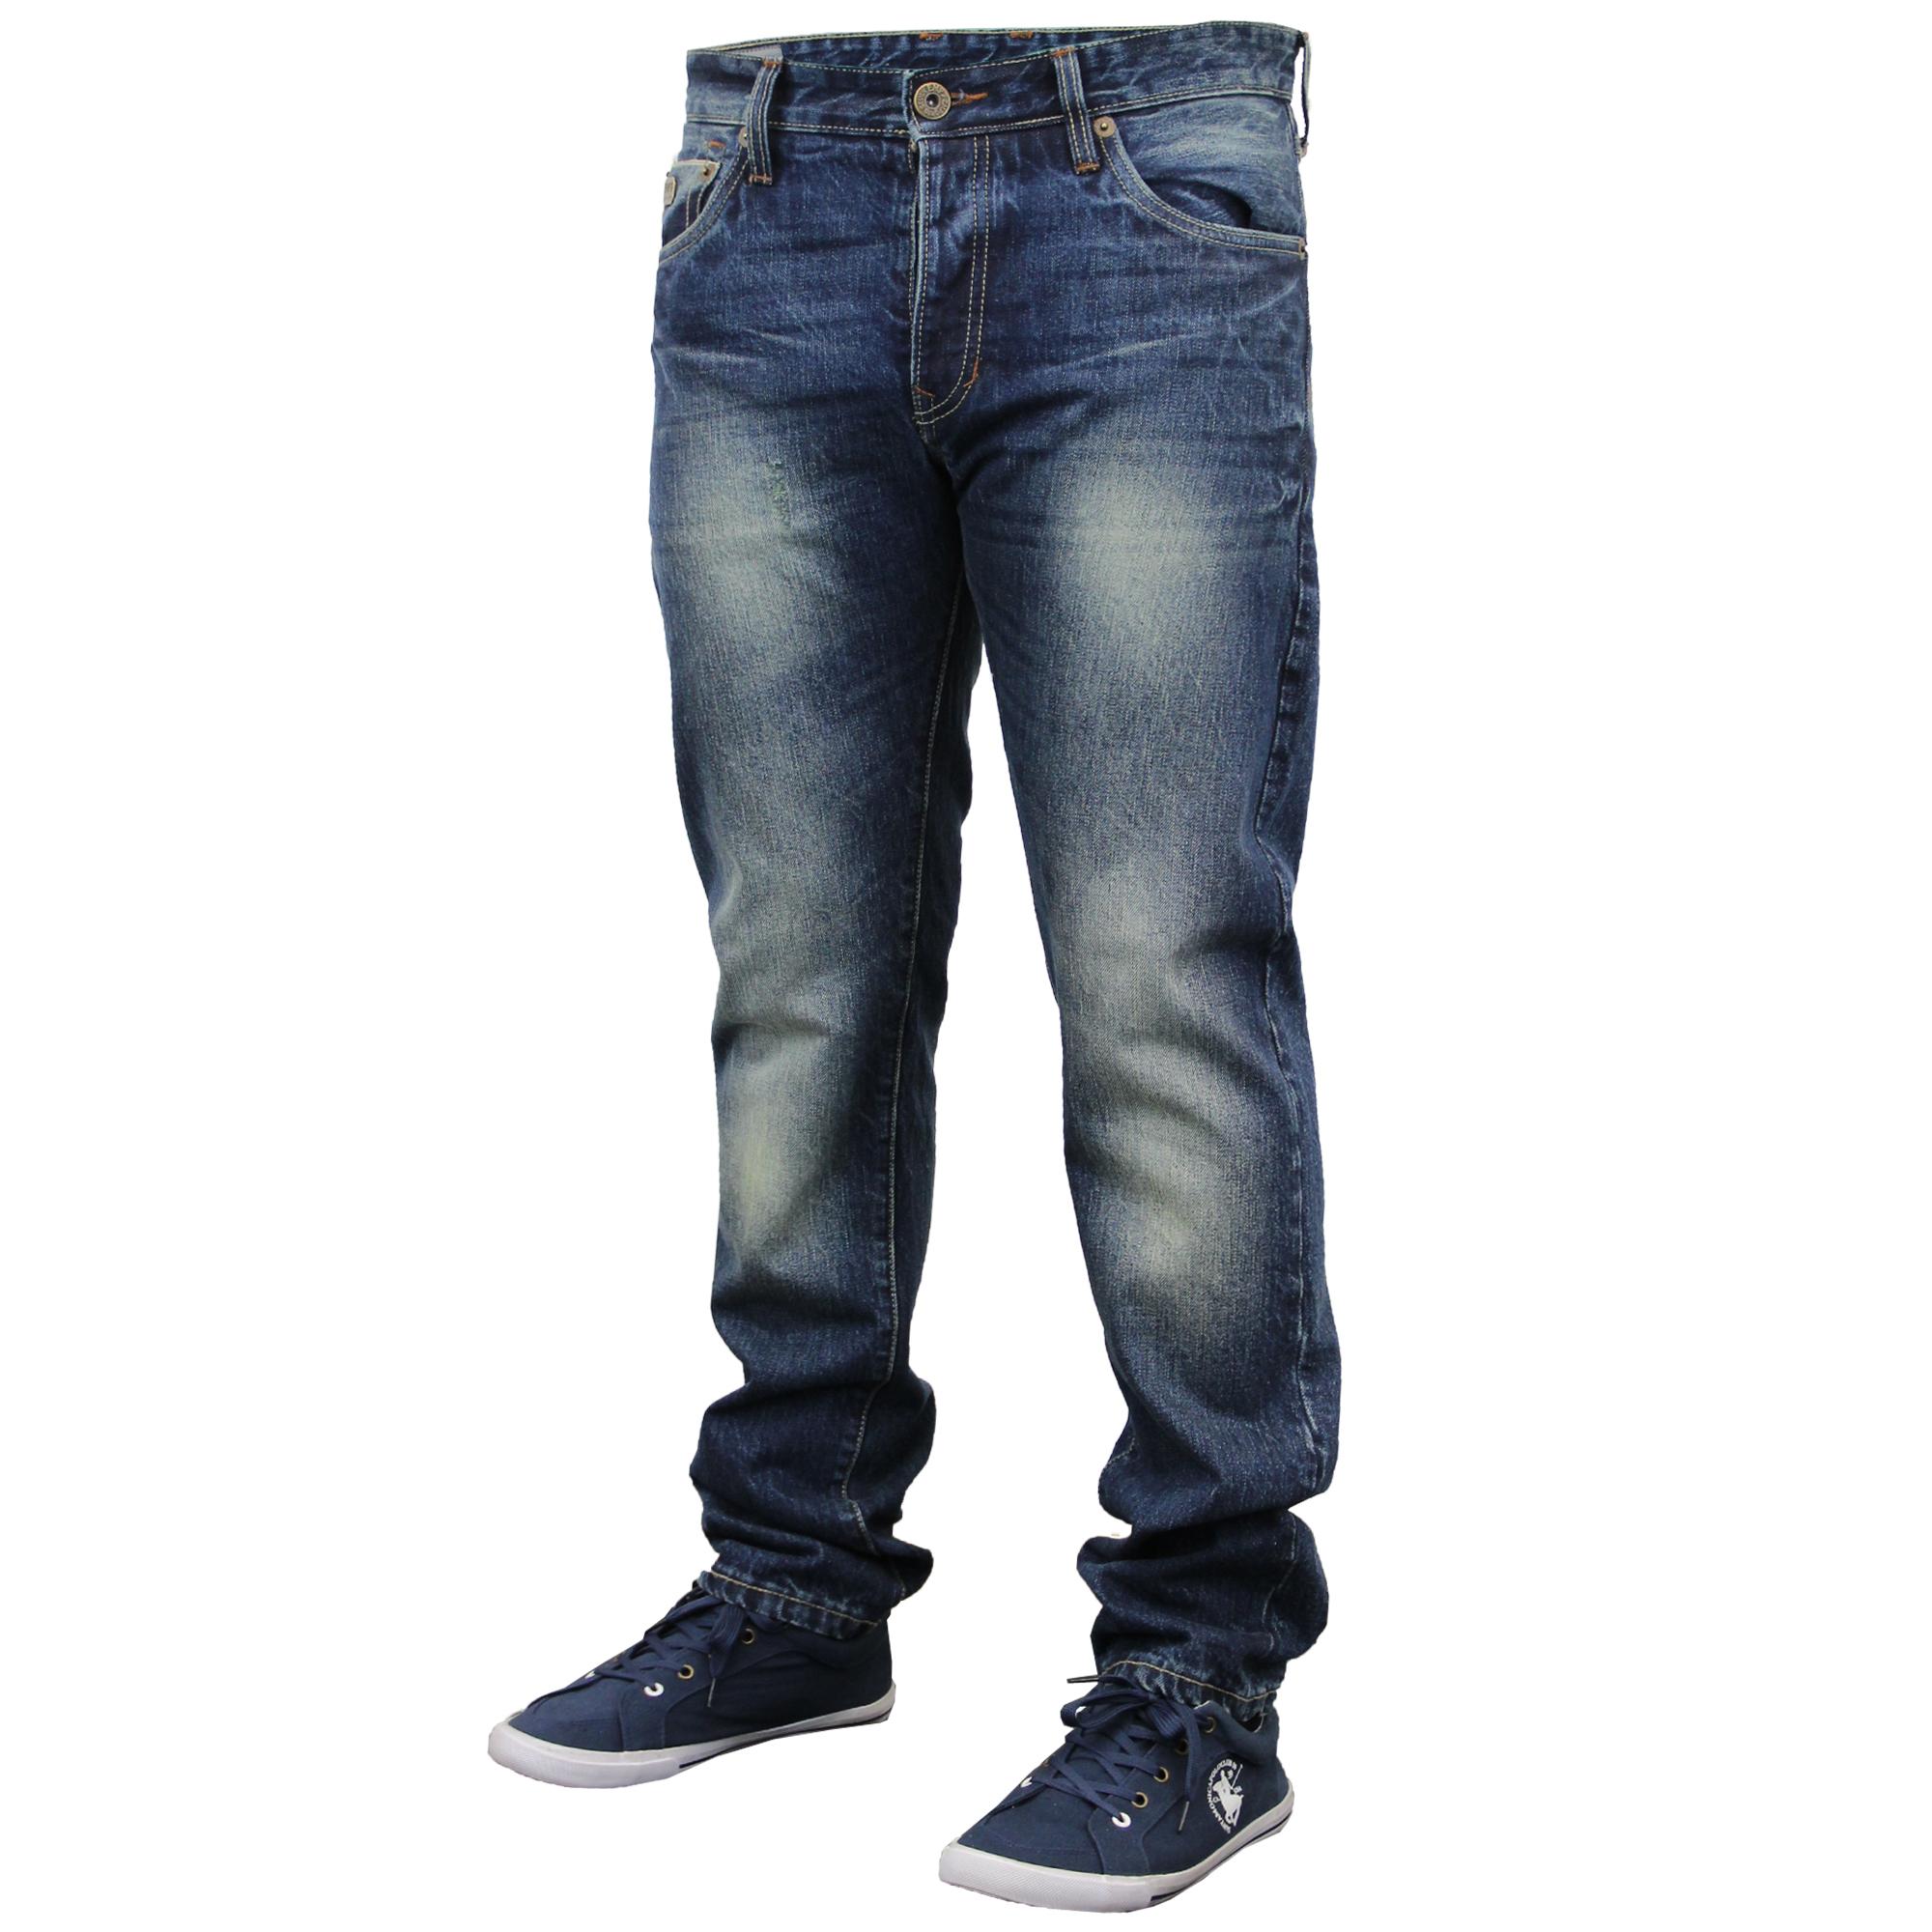 mens Emporio Seven denim jeans pants faded slim fit trousers designer bottoms